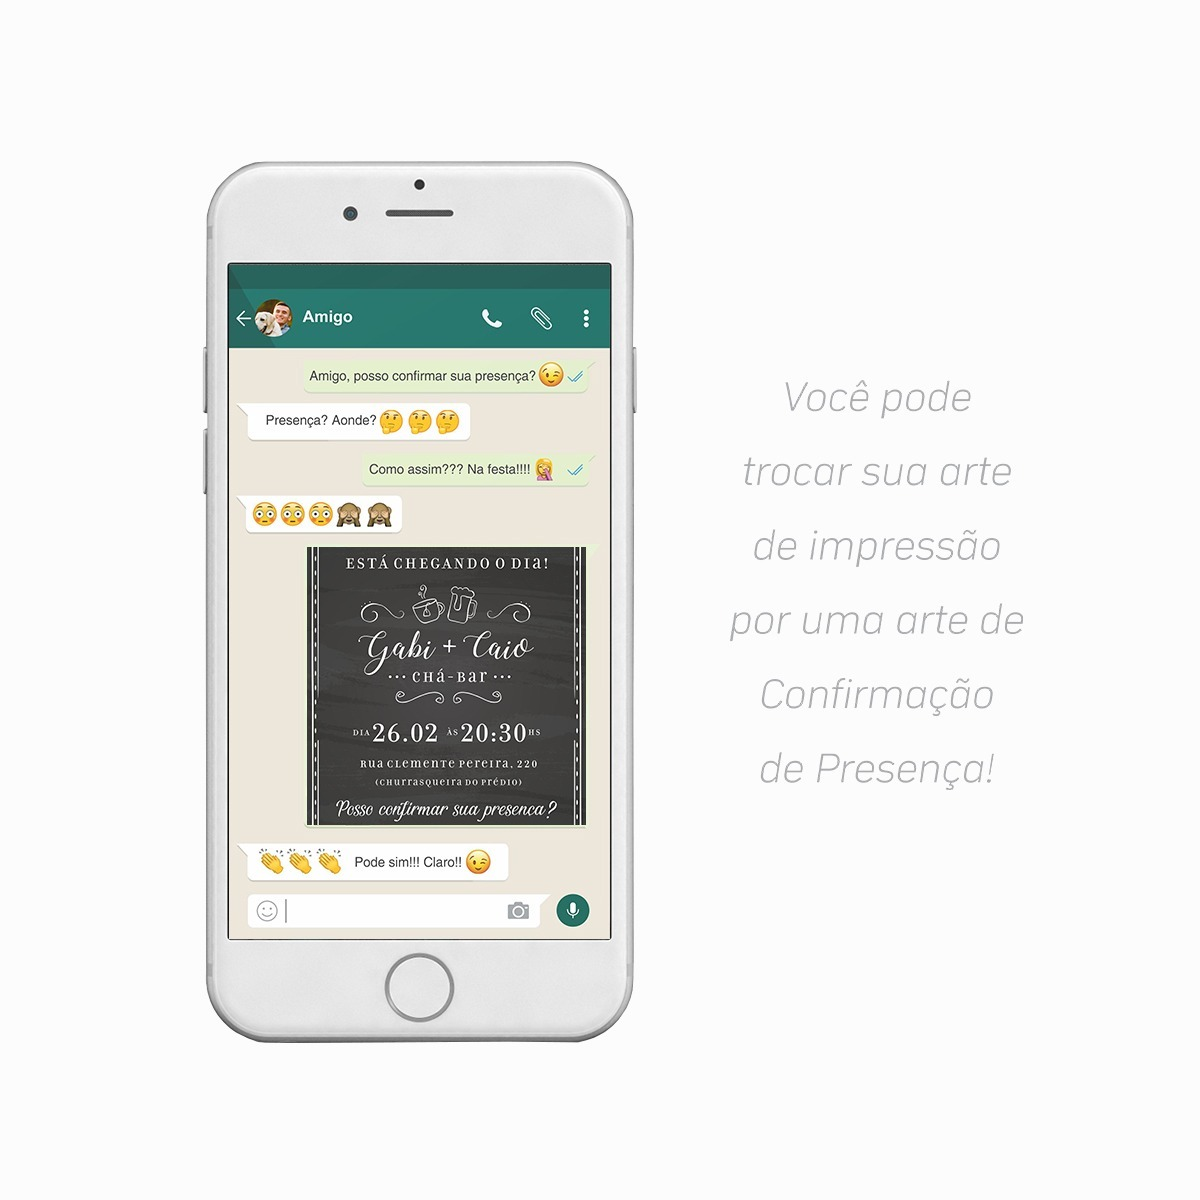 Convite Digital Cha Bar Lousa Boteco Virtual Imprimir R 29 00